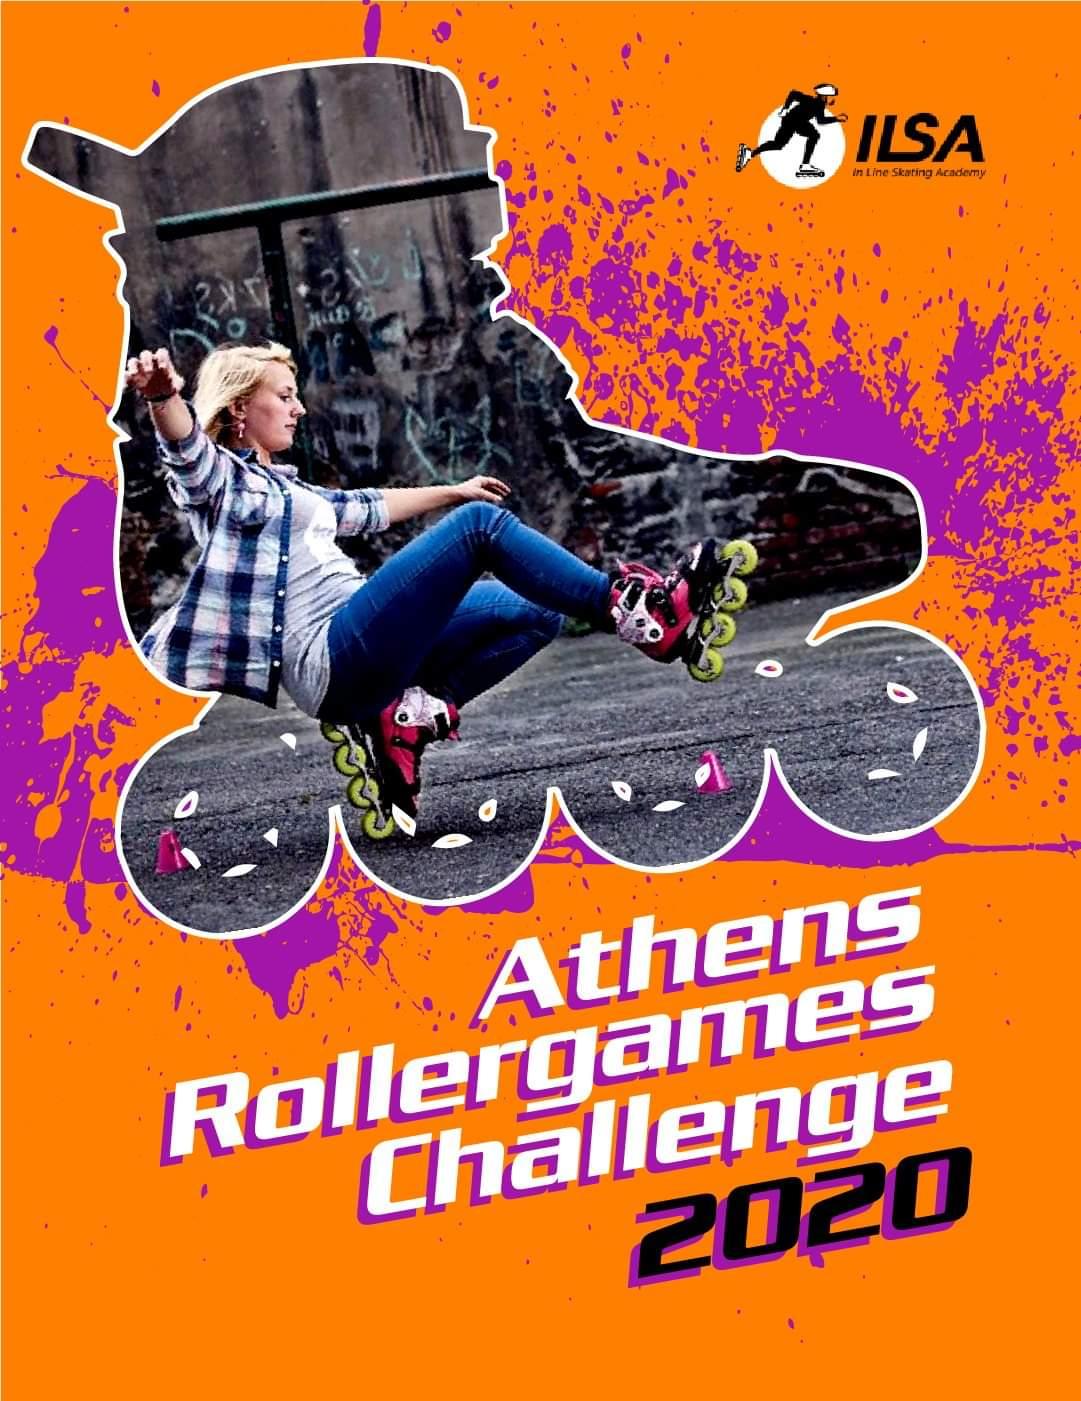 Athens rollergames challenge 2020